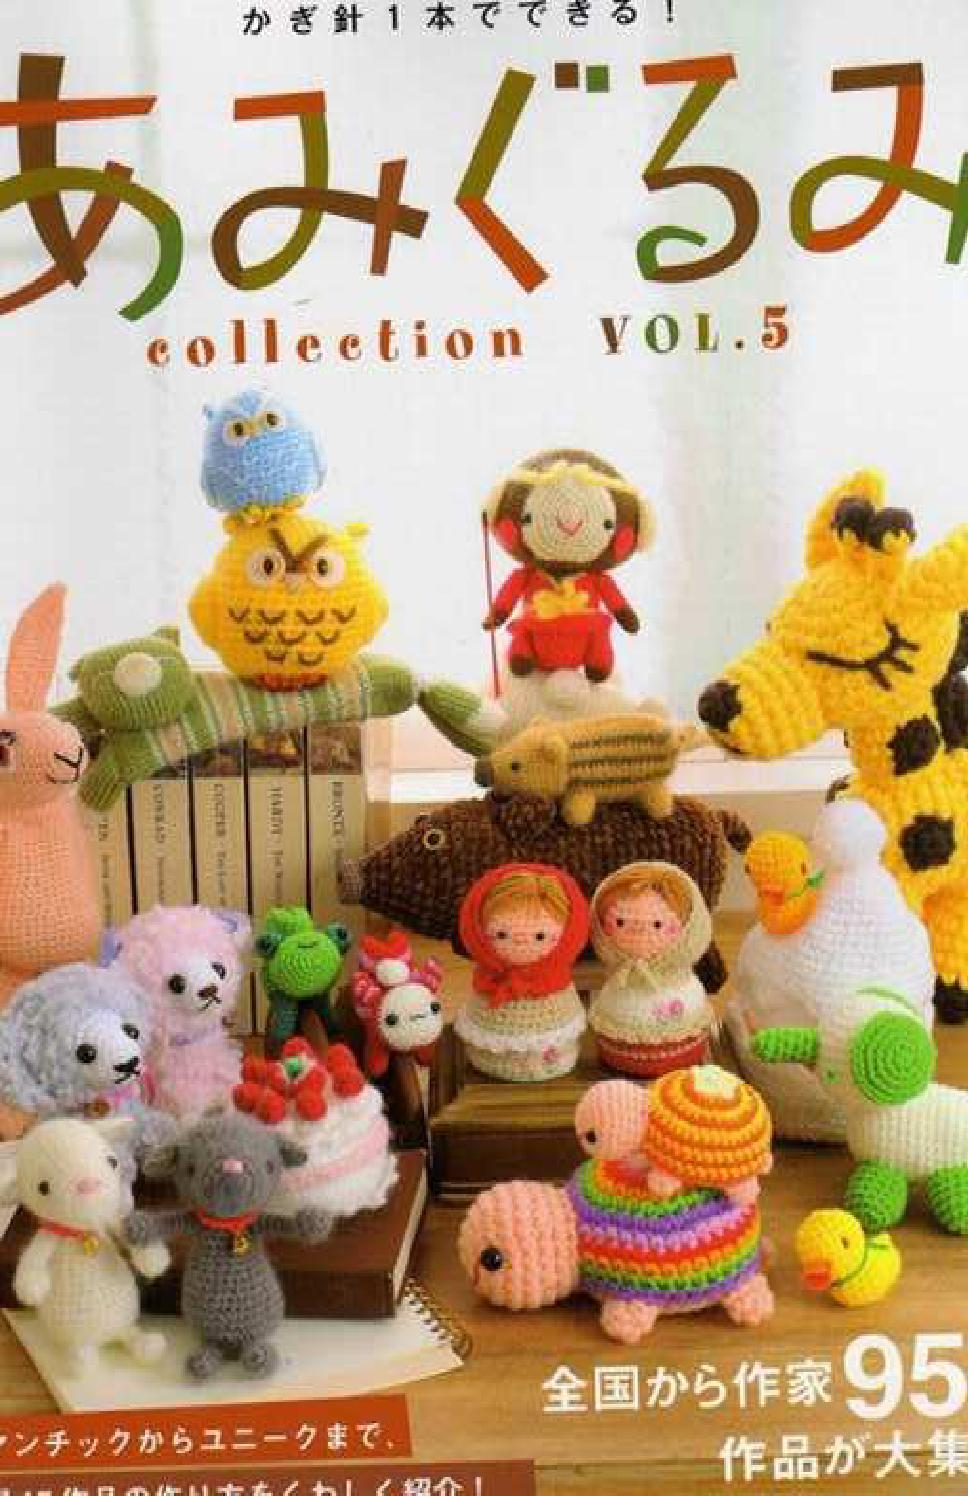 Hoooked Amigurumi Vol 1 : Amigurumi colletion vol 5 para pdf by fyeye - issuu